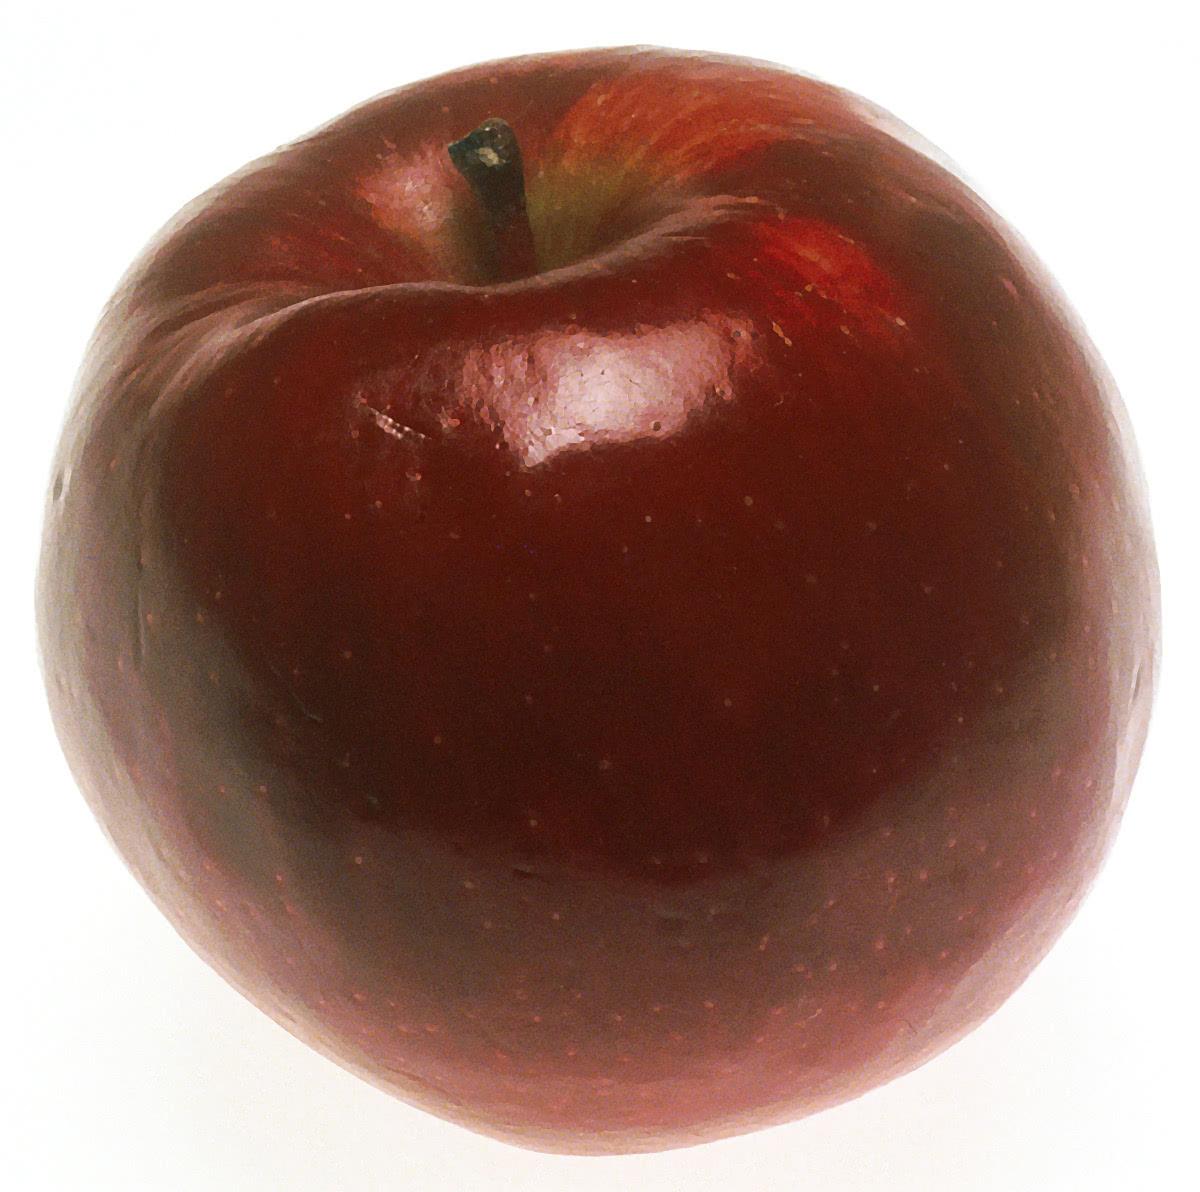 apple large   food  fruit  apple  apples 2  apple large jpg html apple clip art image apples clip art free